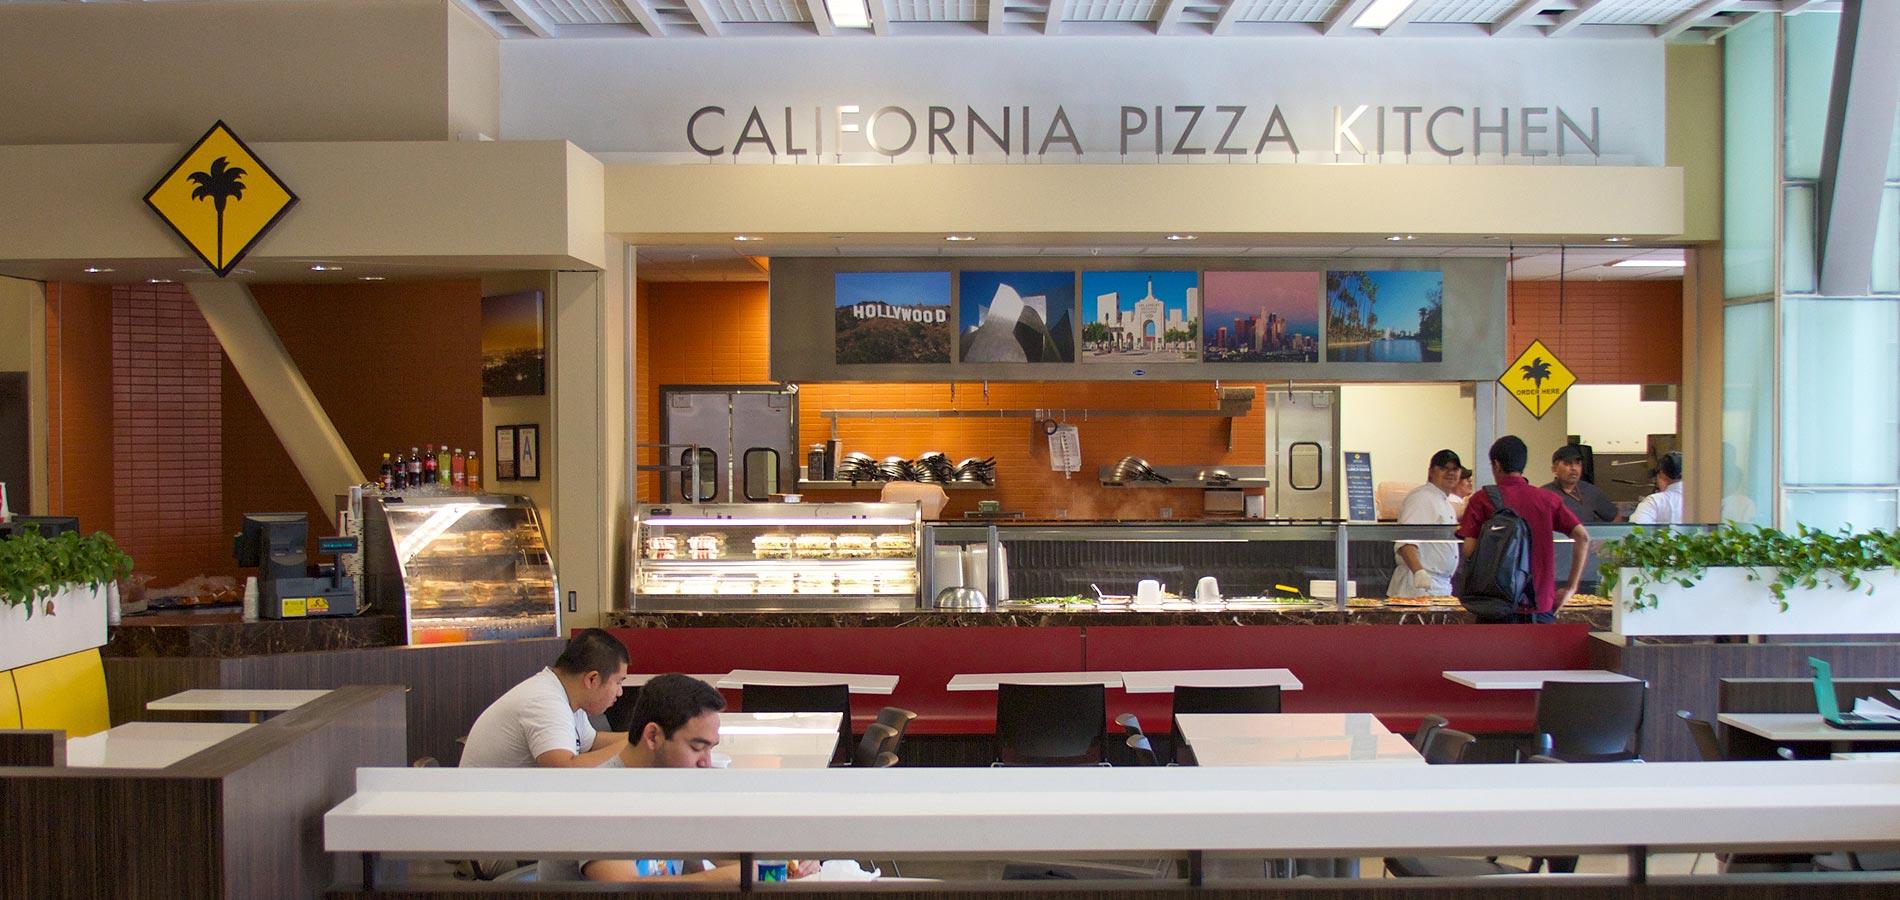 Groovy California Pizza Kitchen Tcc Usc Hospitality Download Free Architecture Designs Intelgarnamadebymaigaardcom